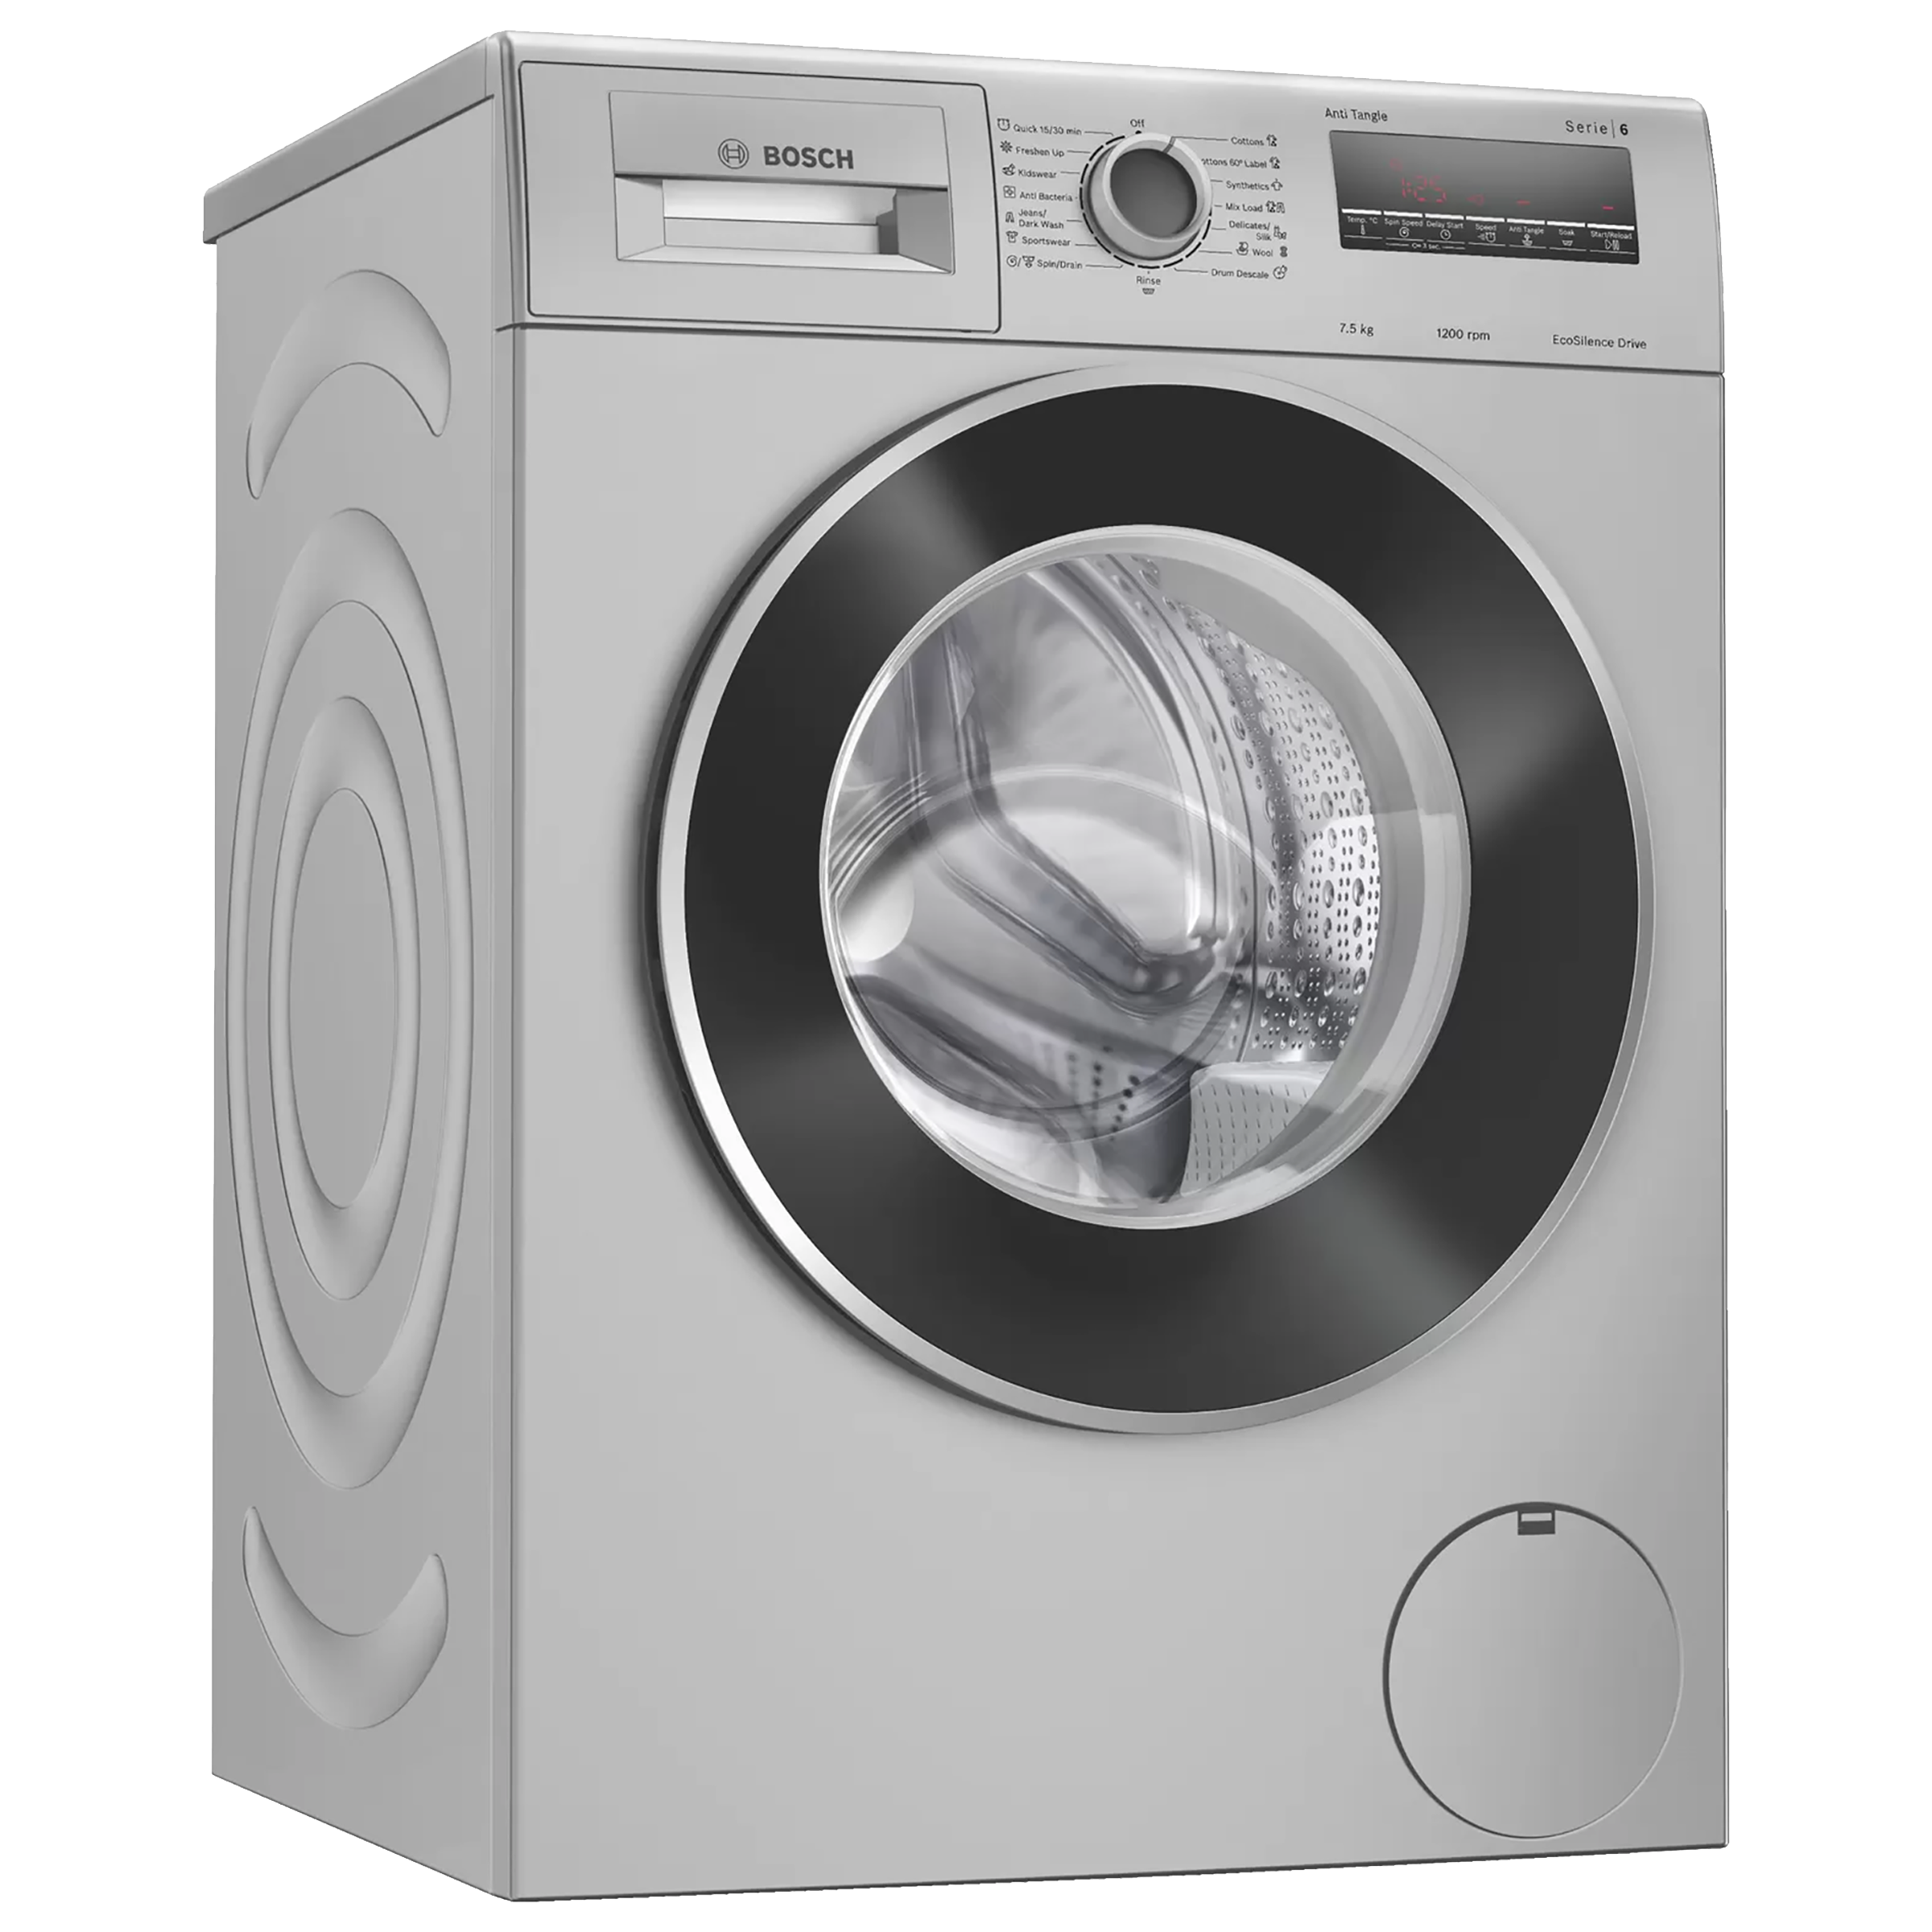 Bosch Serie 6 7.5 kg 5 Star Fully Automatic Front Load Washing Machine (EcoSilence Drive Motor, WAJ2426VIN, Silver)_1